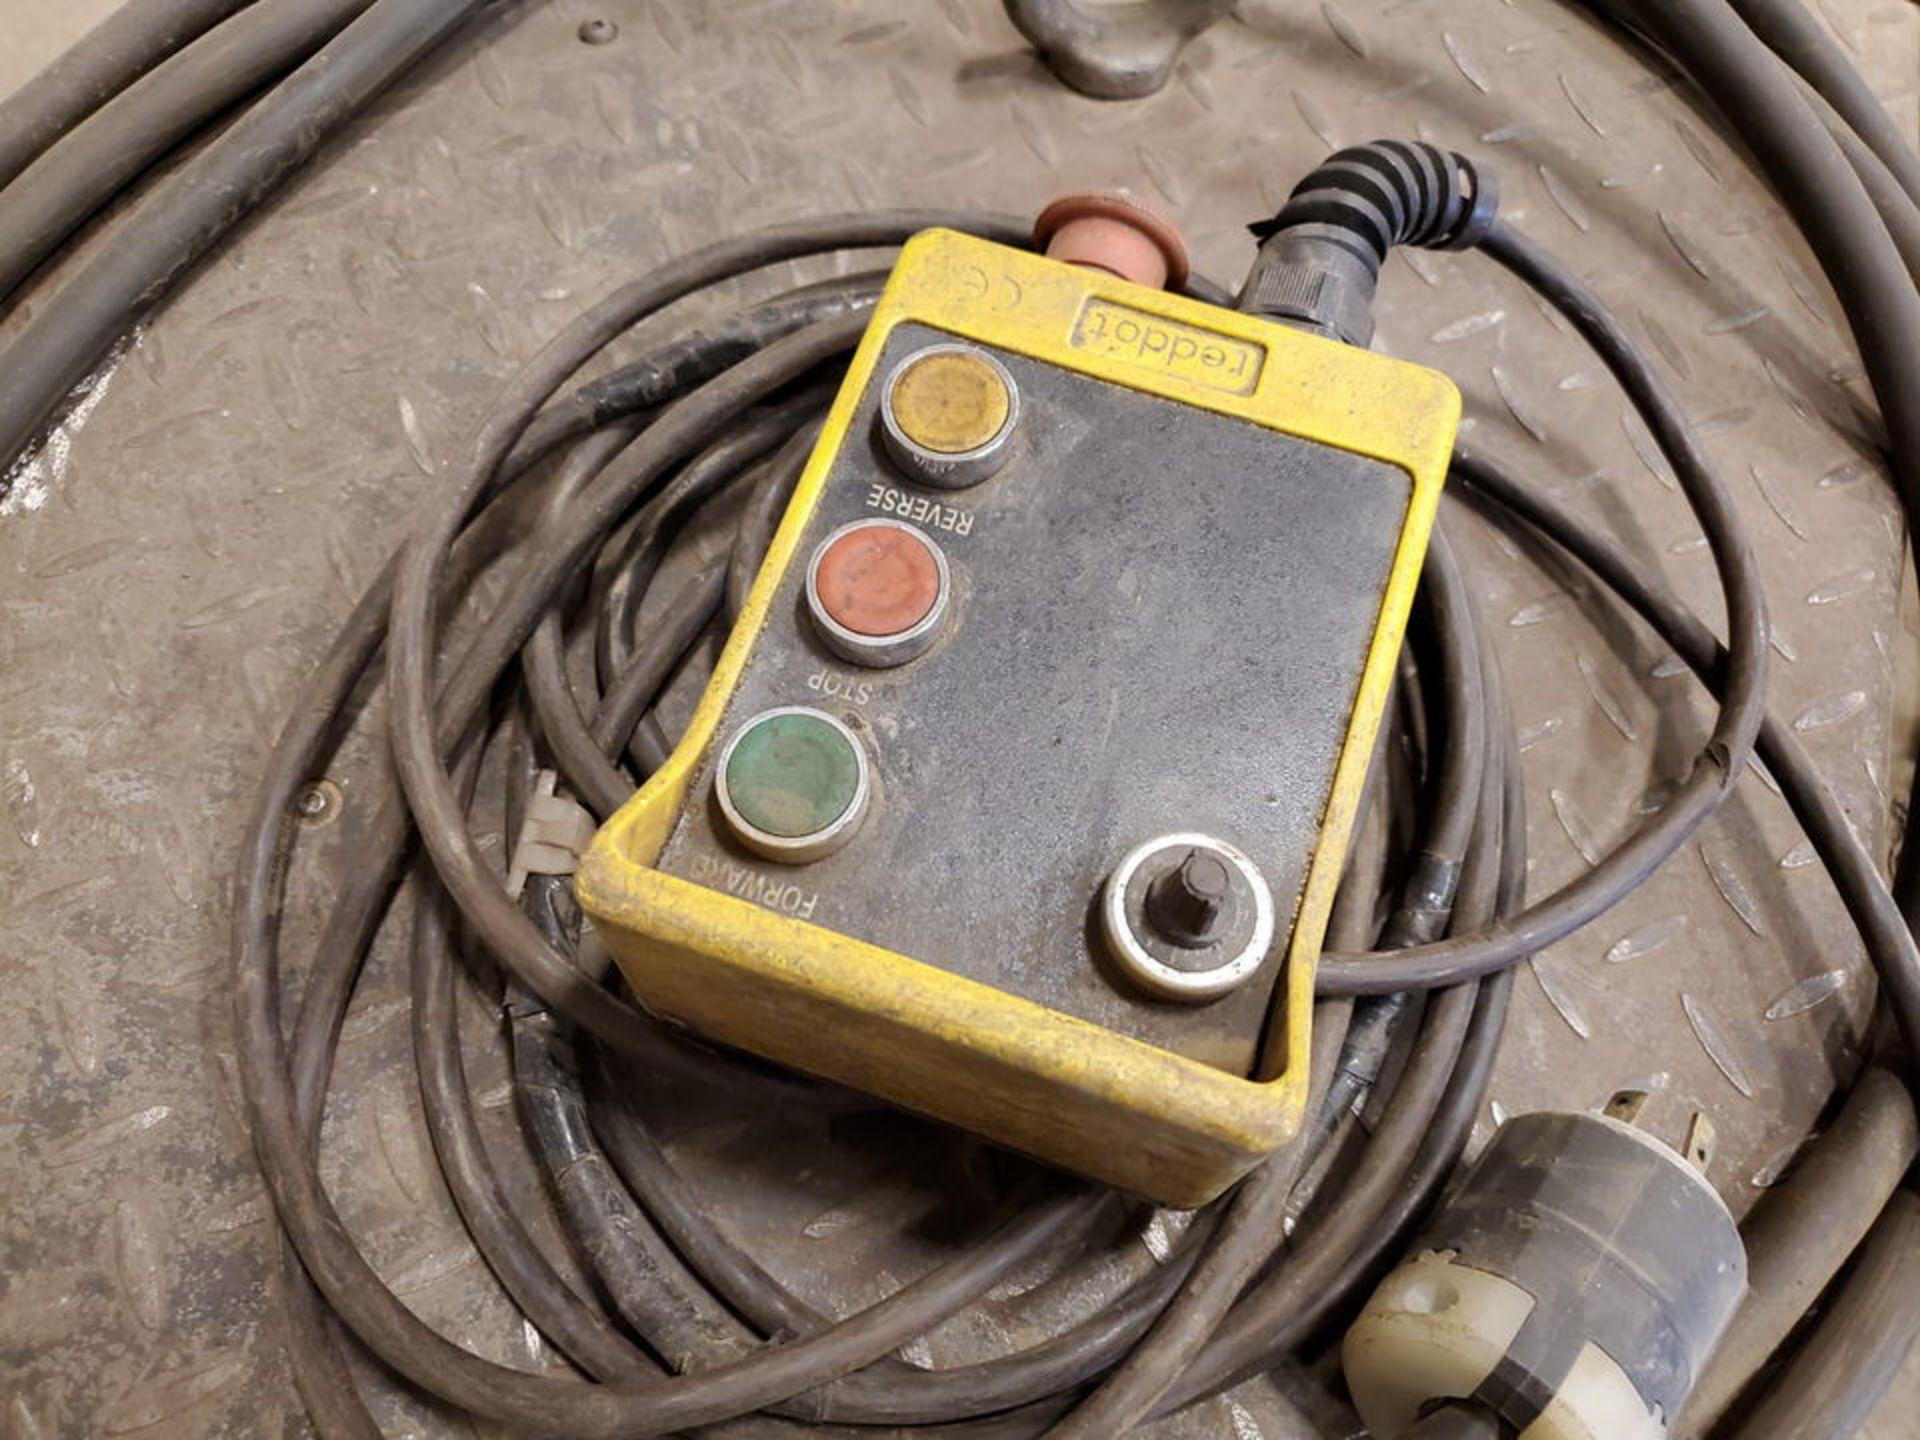 "Profax TR-40000 Turn Roll 20H Cap., 440V, 15A, 50/60HZ, 3PH, RPM: 0-1.7, 6"" Wheel Dia. - Image 7 of 8"